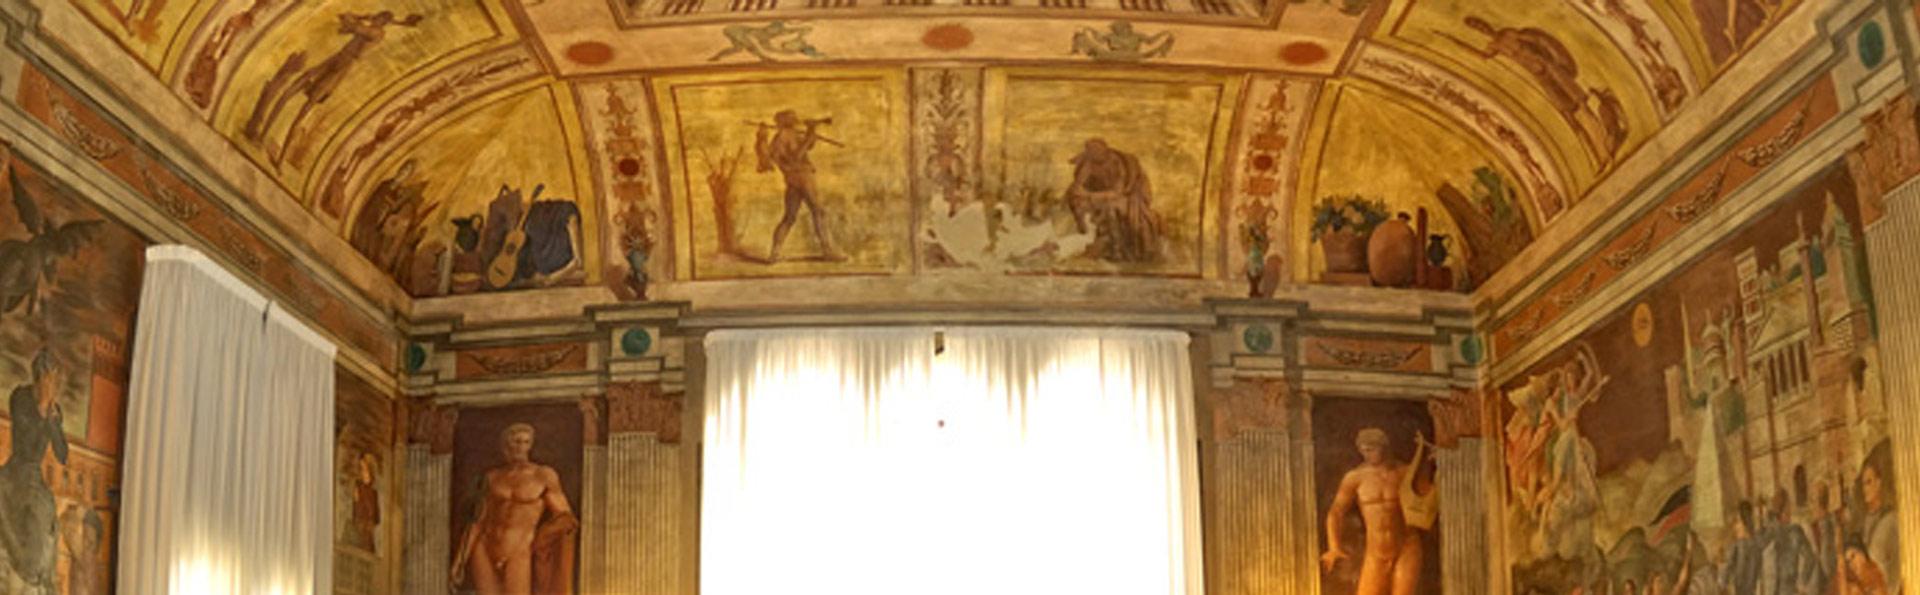 Sala dell'Arengo- Ferrara